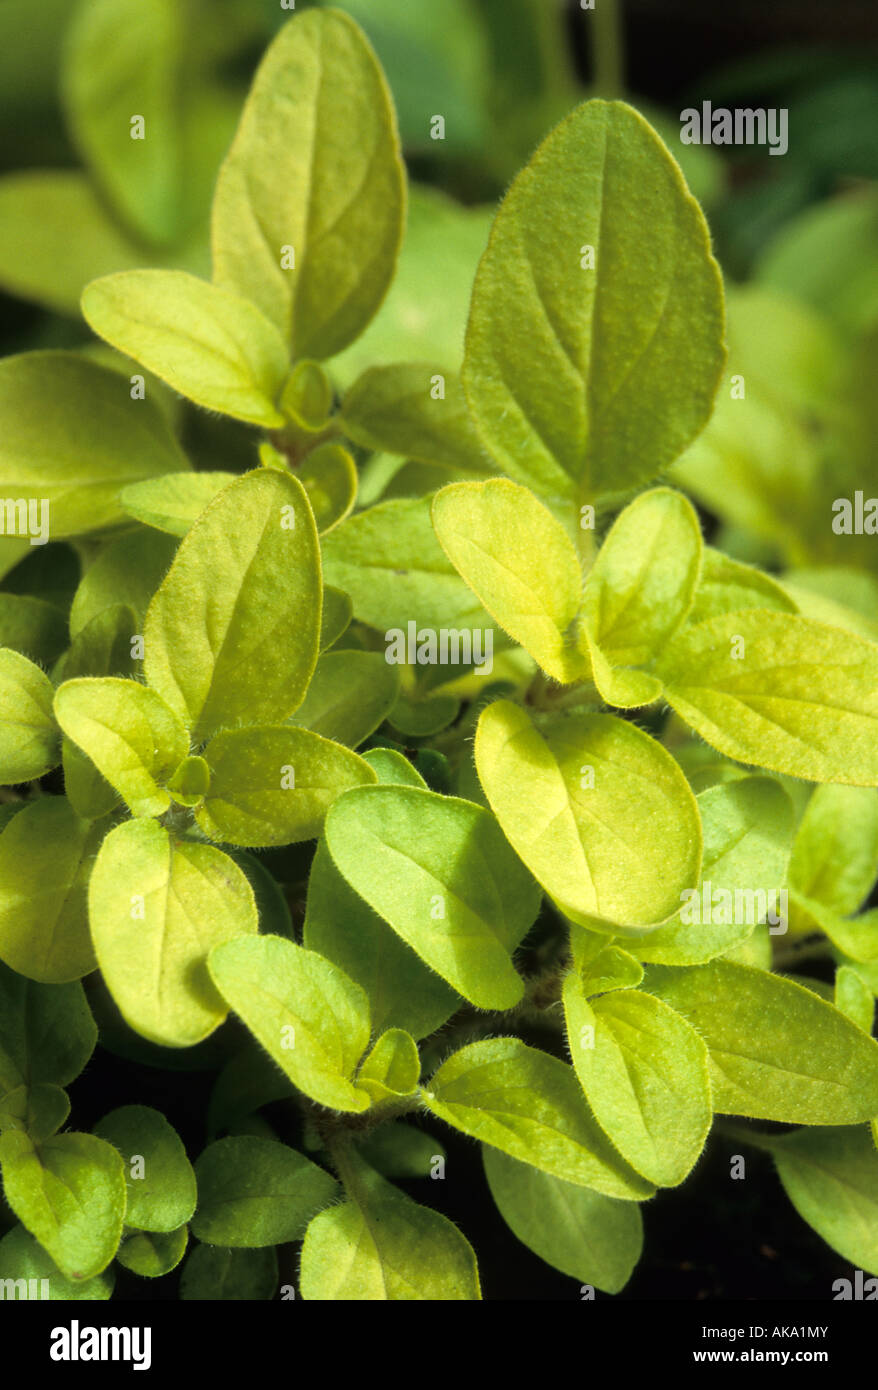 Golden Mejorana Origanum onites hierba Aurea Foto de stock